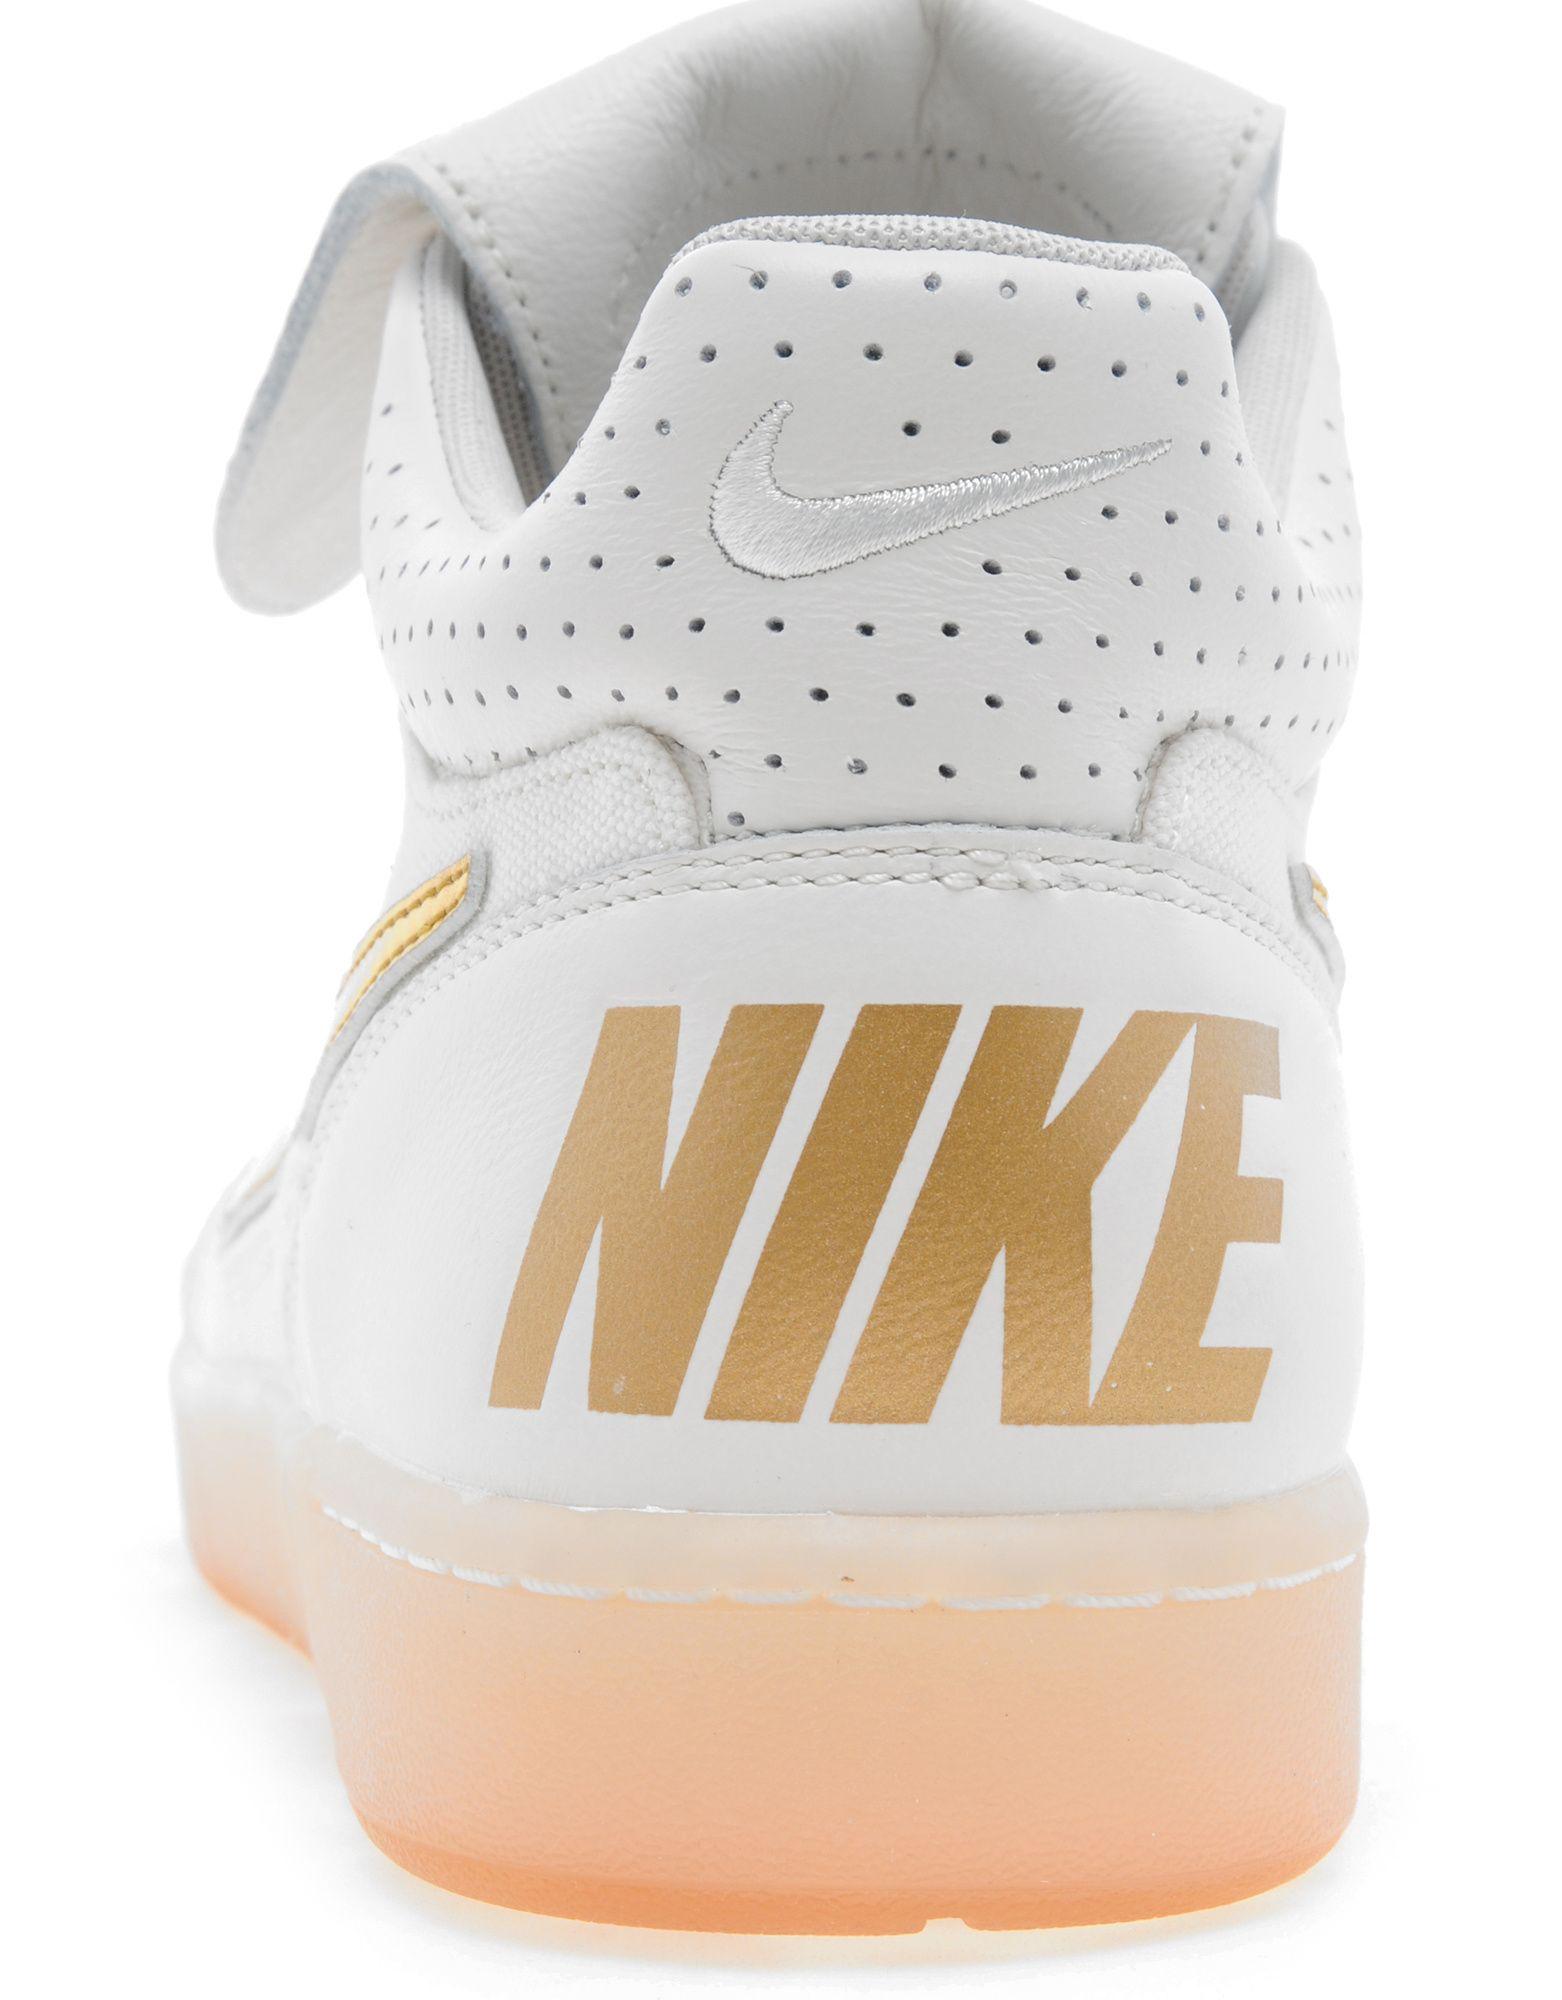 Nike Tiempo Mid 94 NFC